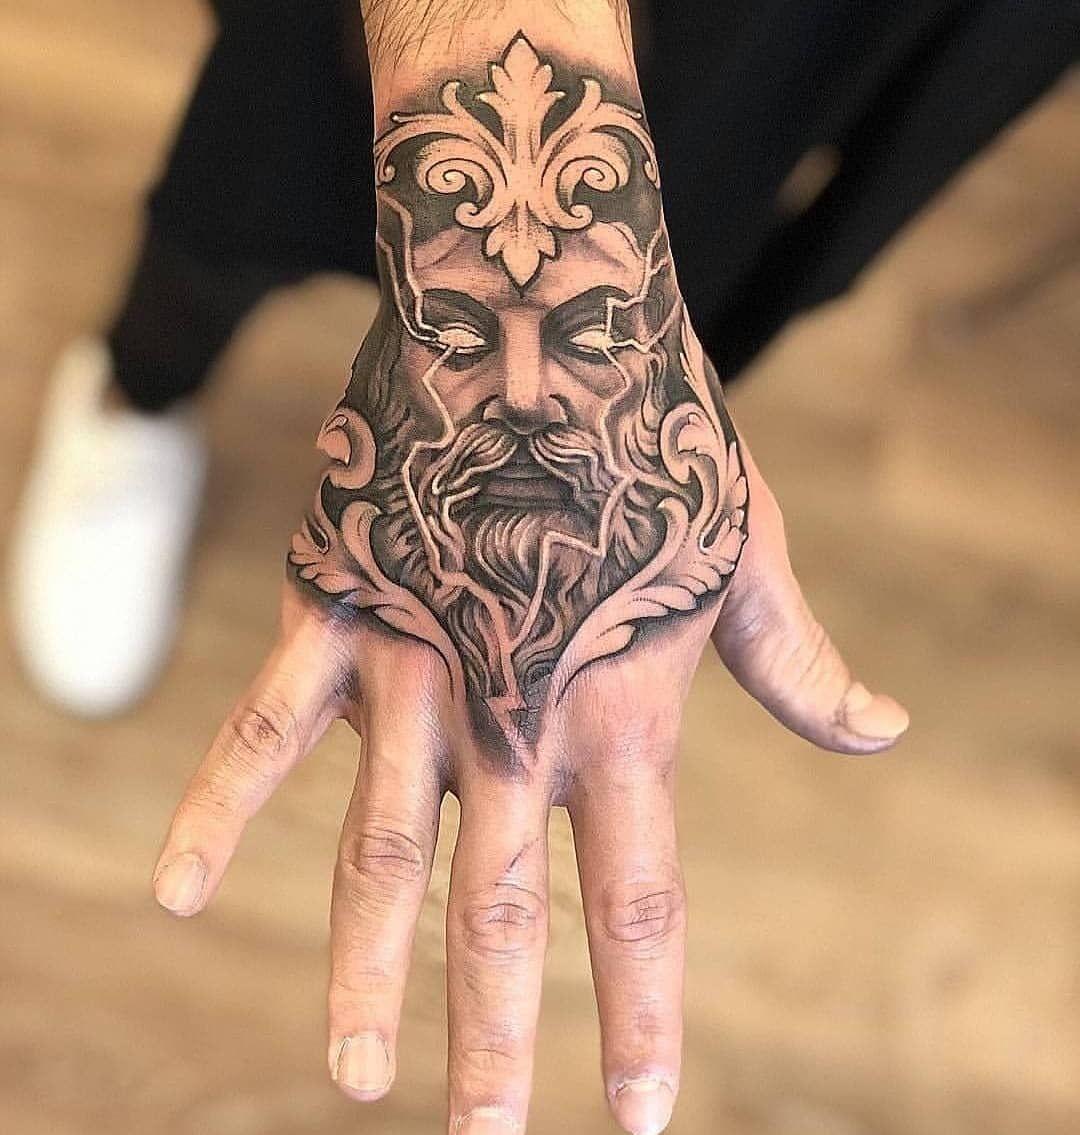 Tatuajes Tattoos En Instagram Siguelos Tatuajespicswomen Tatuajespicsmen Tatuajes En La Mano Tatuajes En La Mano Para Hombres Tatuaje De La Mano